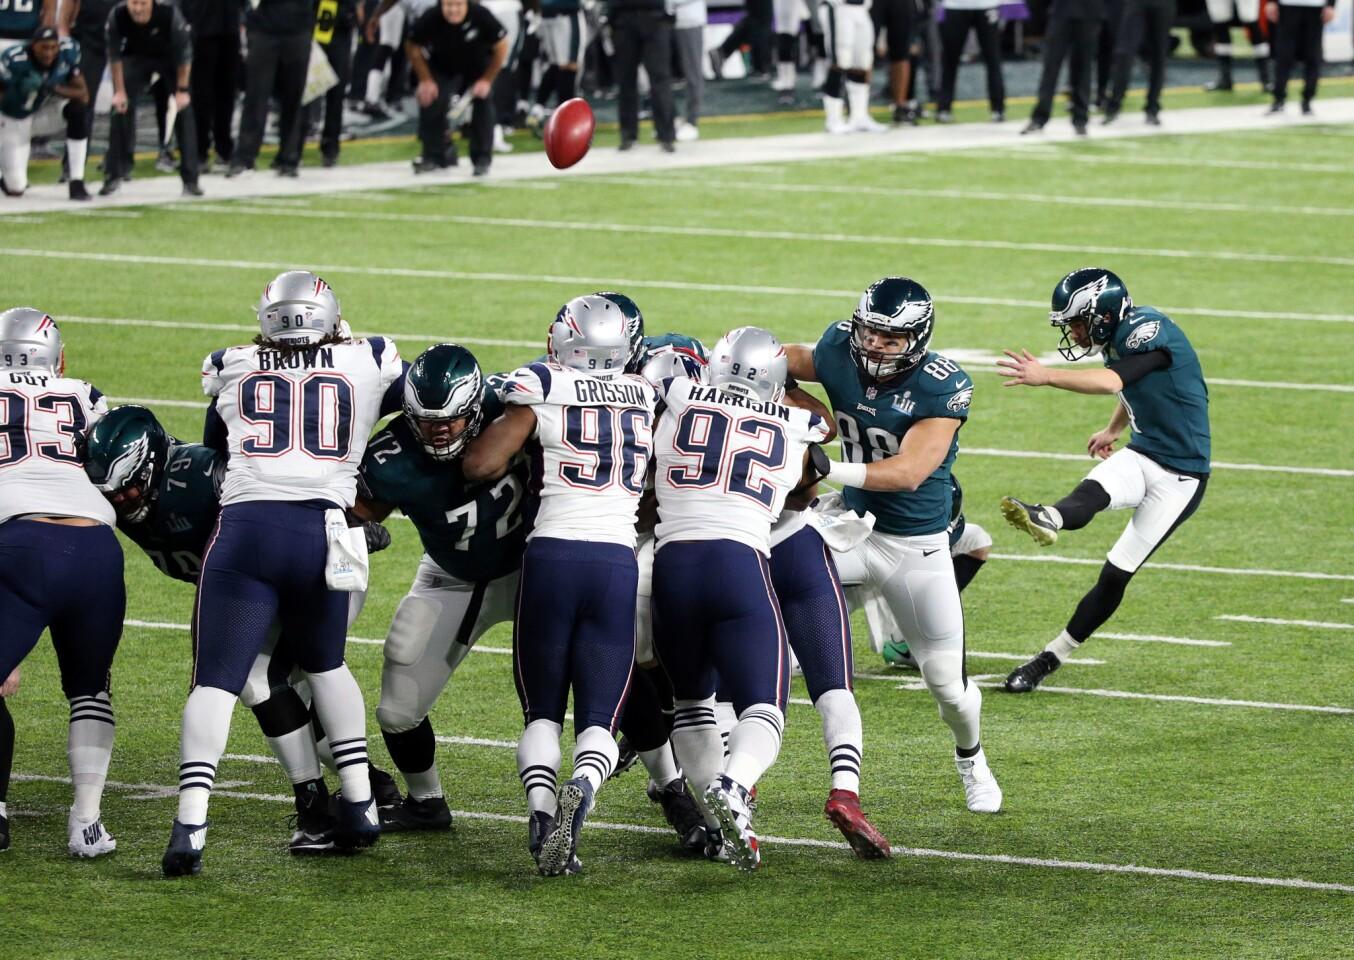 Feb 4, 2018; Minneapolis, MN, USA; Philadelphia Eagles kicker Jake Elliott (4) makes a field goal against the New England Patriots during the first quarter in Super Bowl LII at U.S. Bank Stadium.